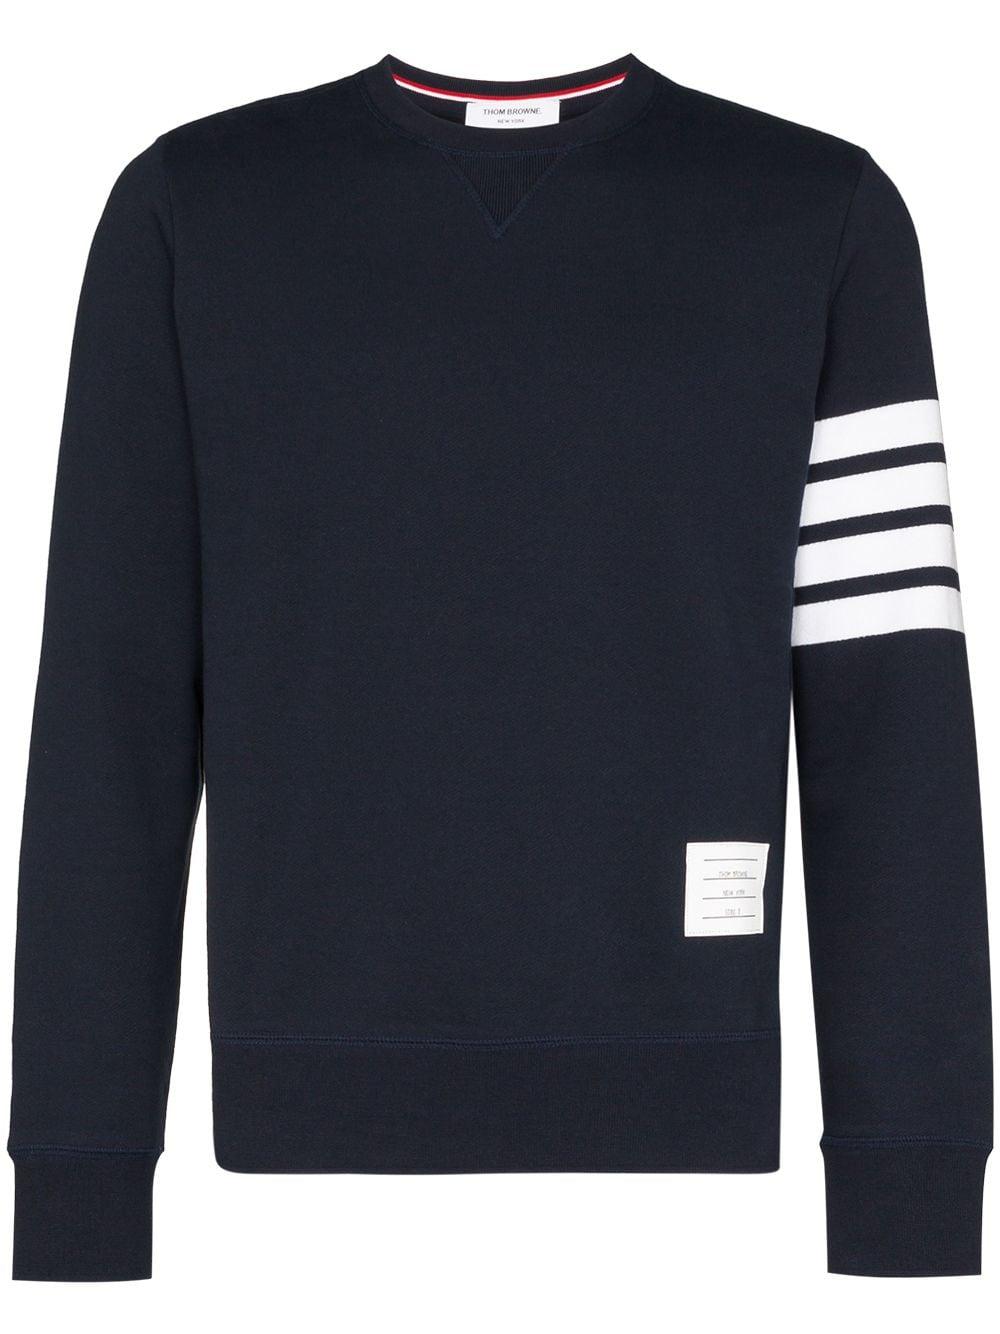 Thom Browne Sweatshirt mit gestreiftem Ärmel - Blau